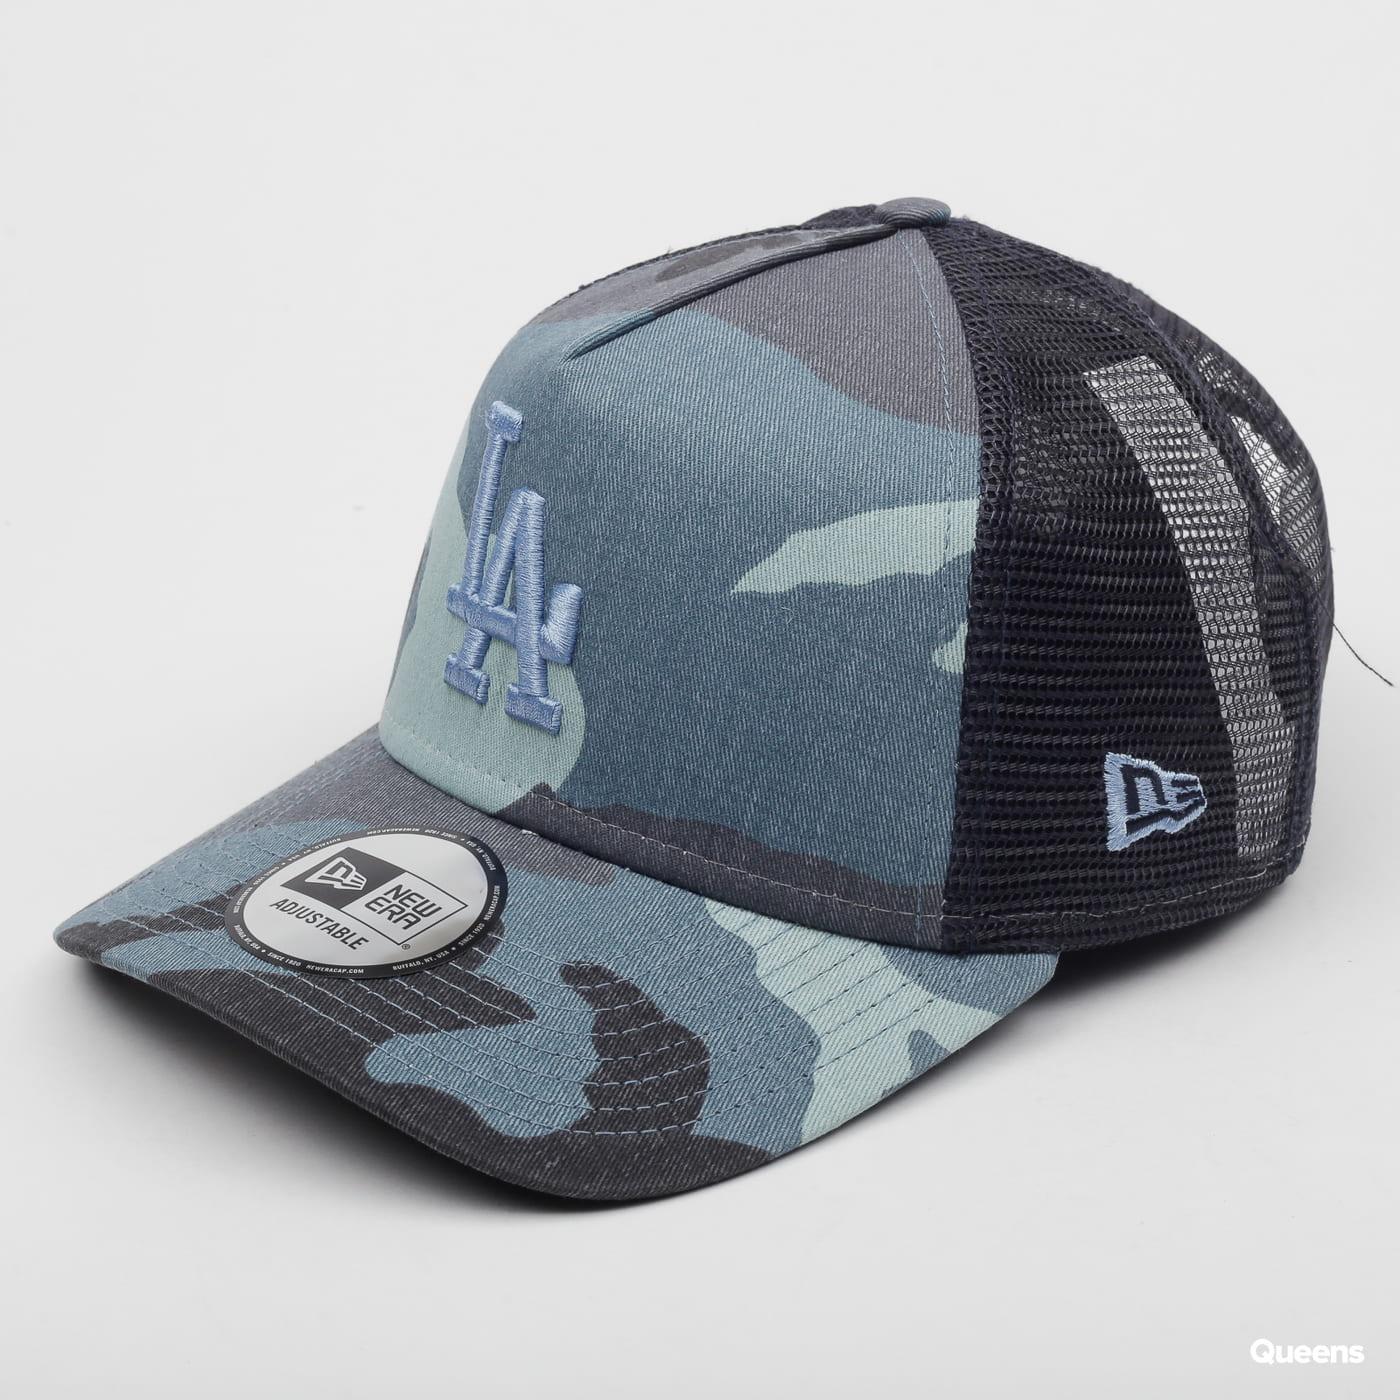 4df56d608 Šiltovka New Era 940 AF Trucker MLB LA camo modrá / navy (11871649) –  Queens 💚